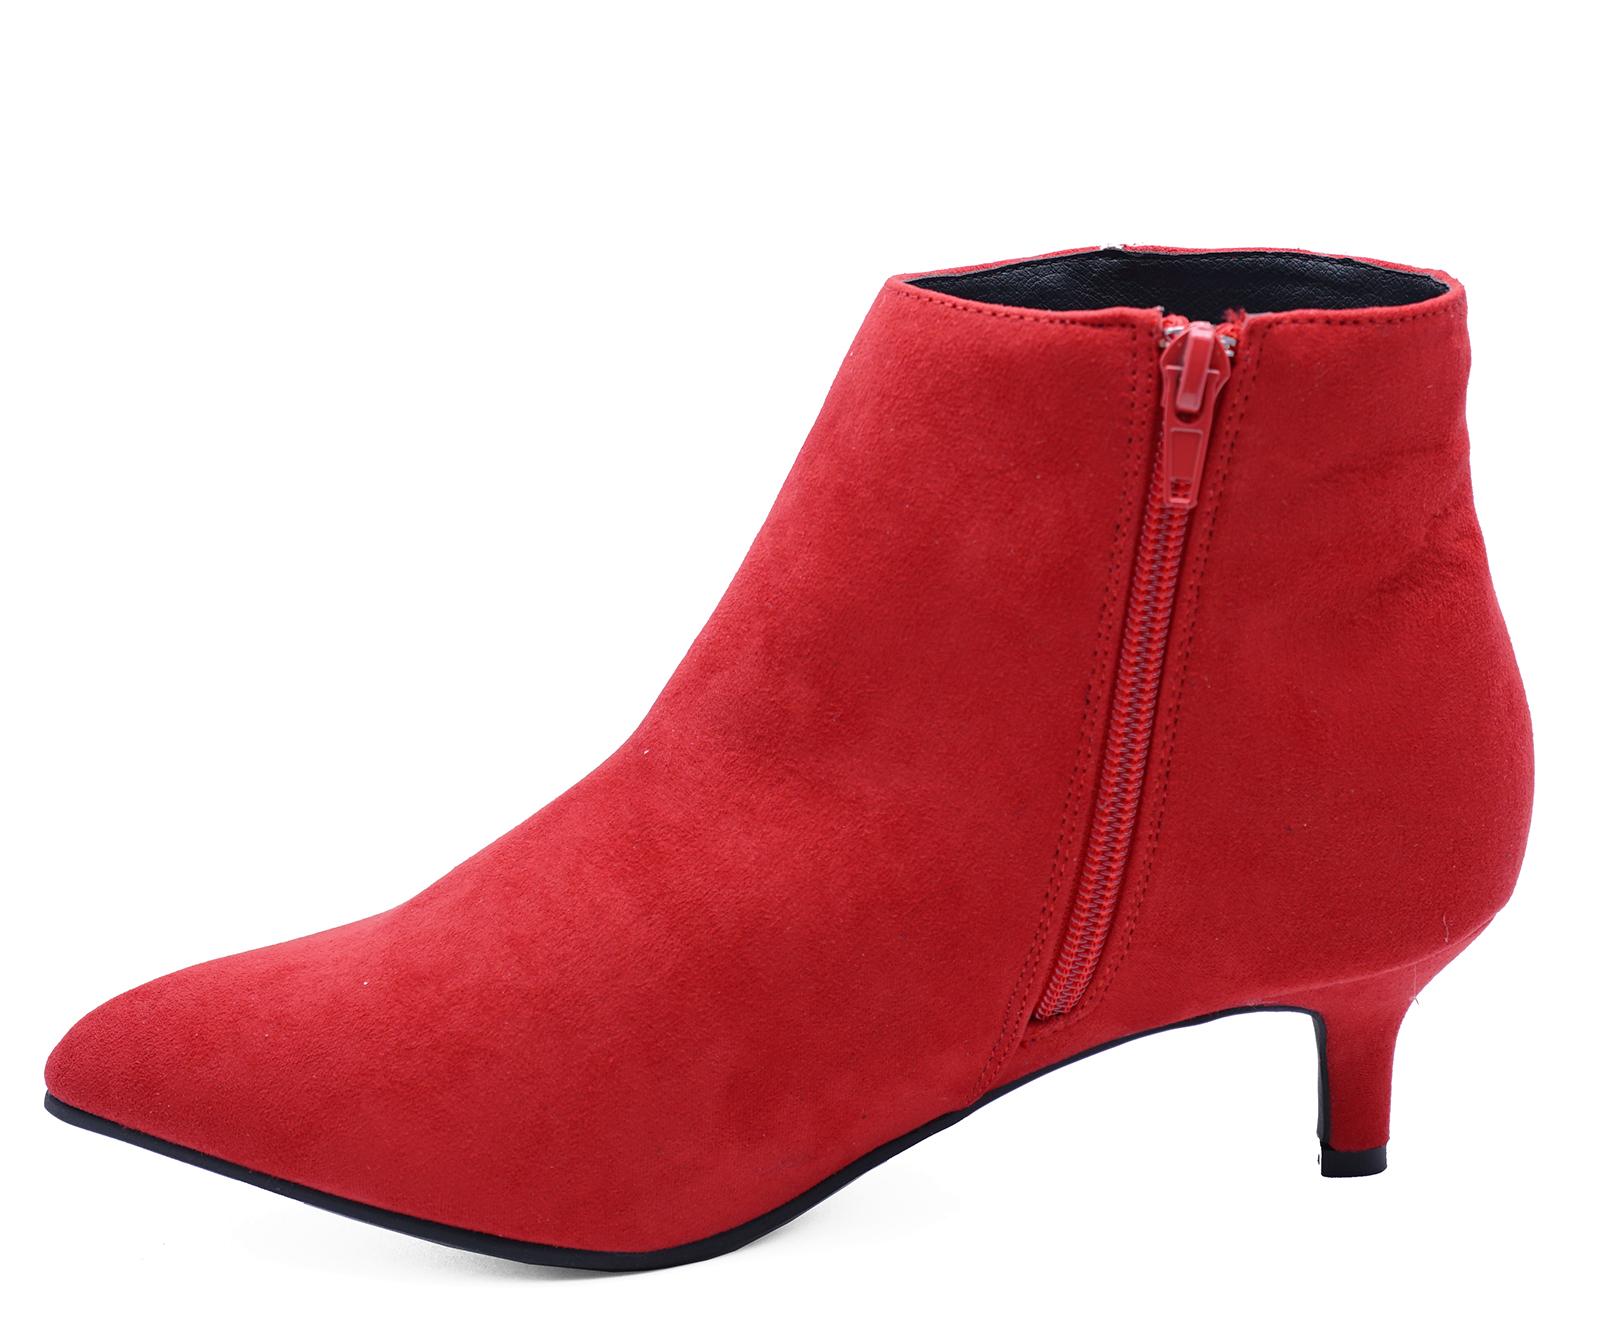 LADIES RED ZIP UP KITTEN LOW HEEL FAUX SUEDE ANKLE BOOTS